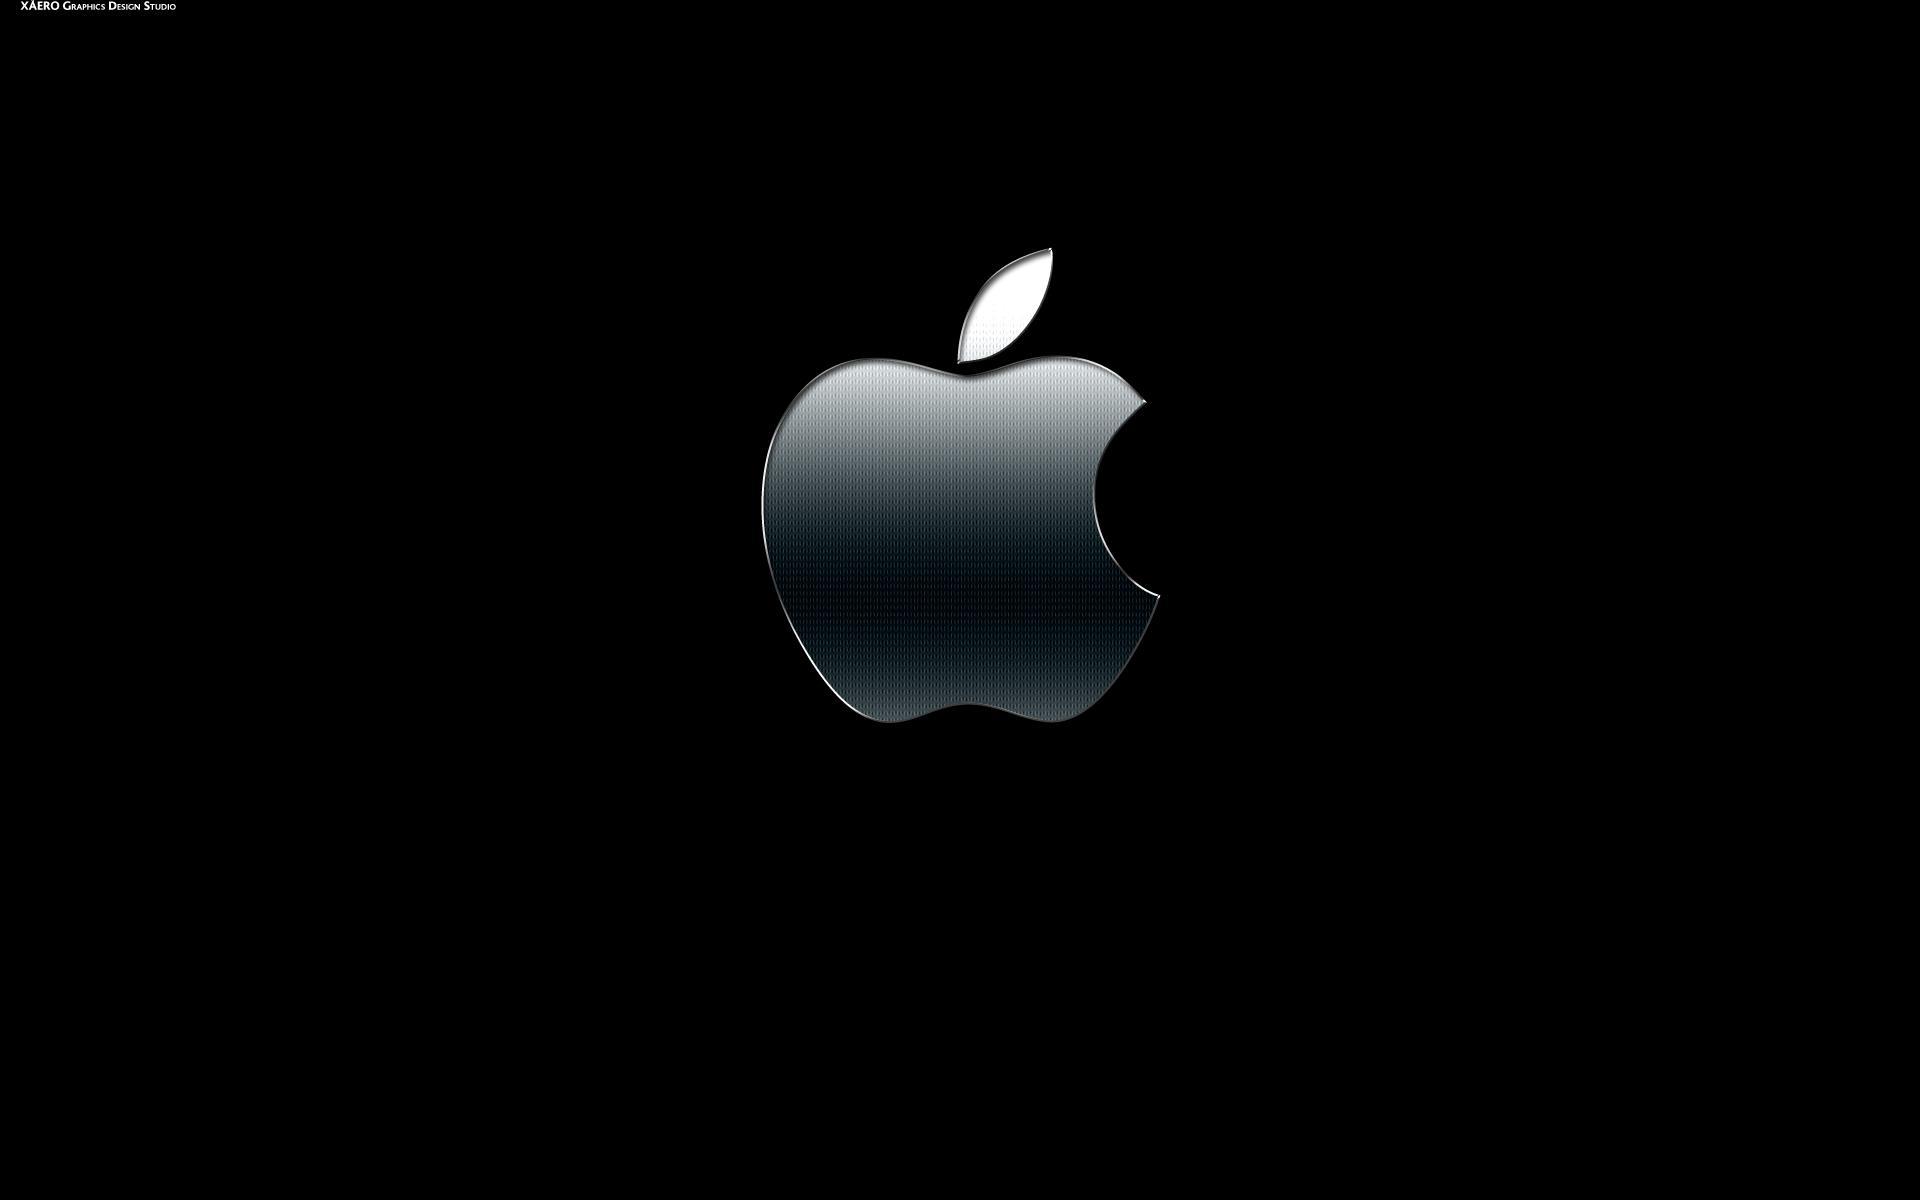 Magnificent 46 Apple Desktop Wallpaper Free Download On Wallpapersafari Complete Home Design Collection Epsylindsey Bellcom